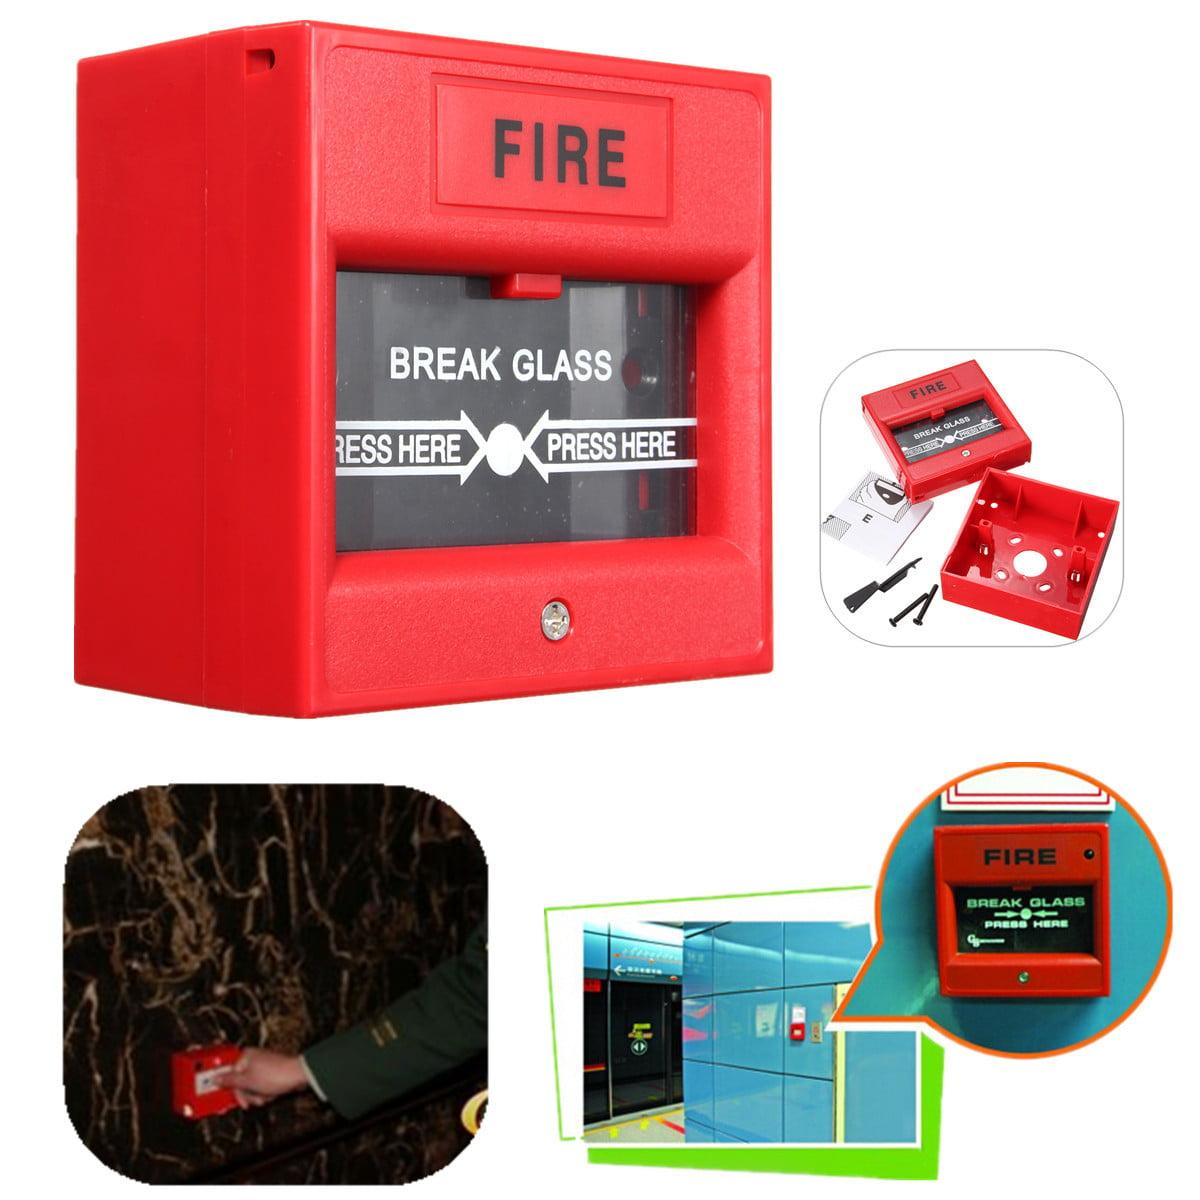 Emergency Door Release Glass Break Fire Alarm Button For Access